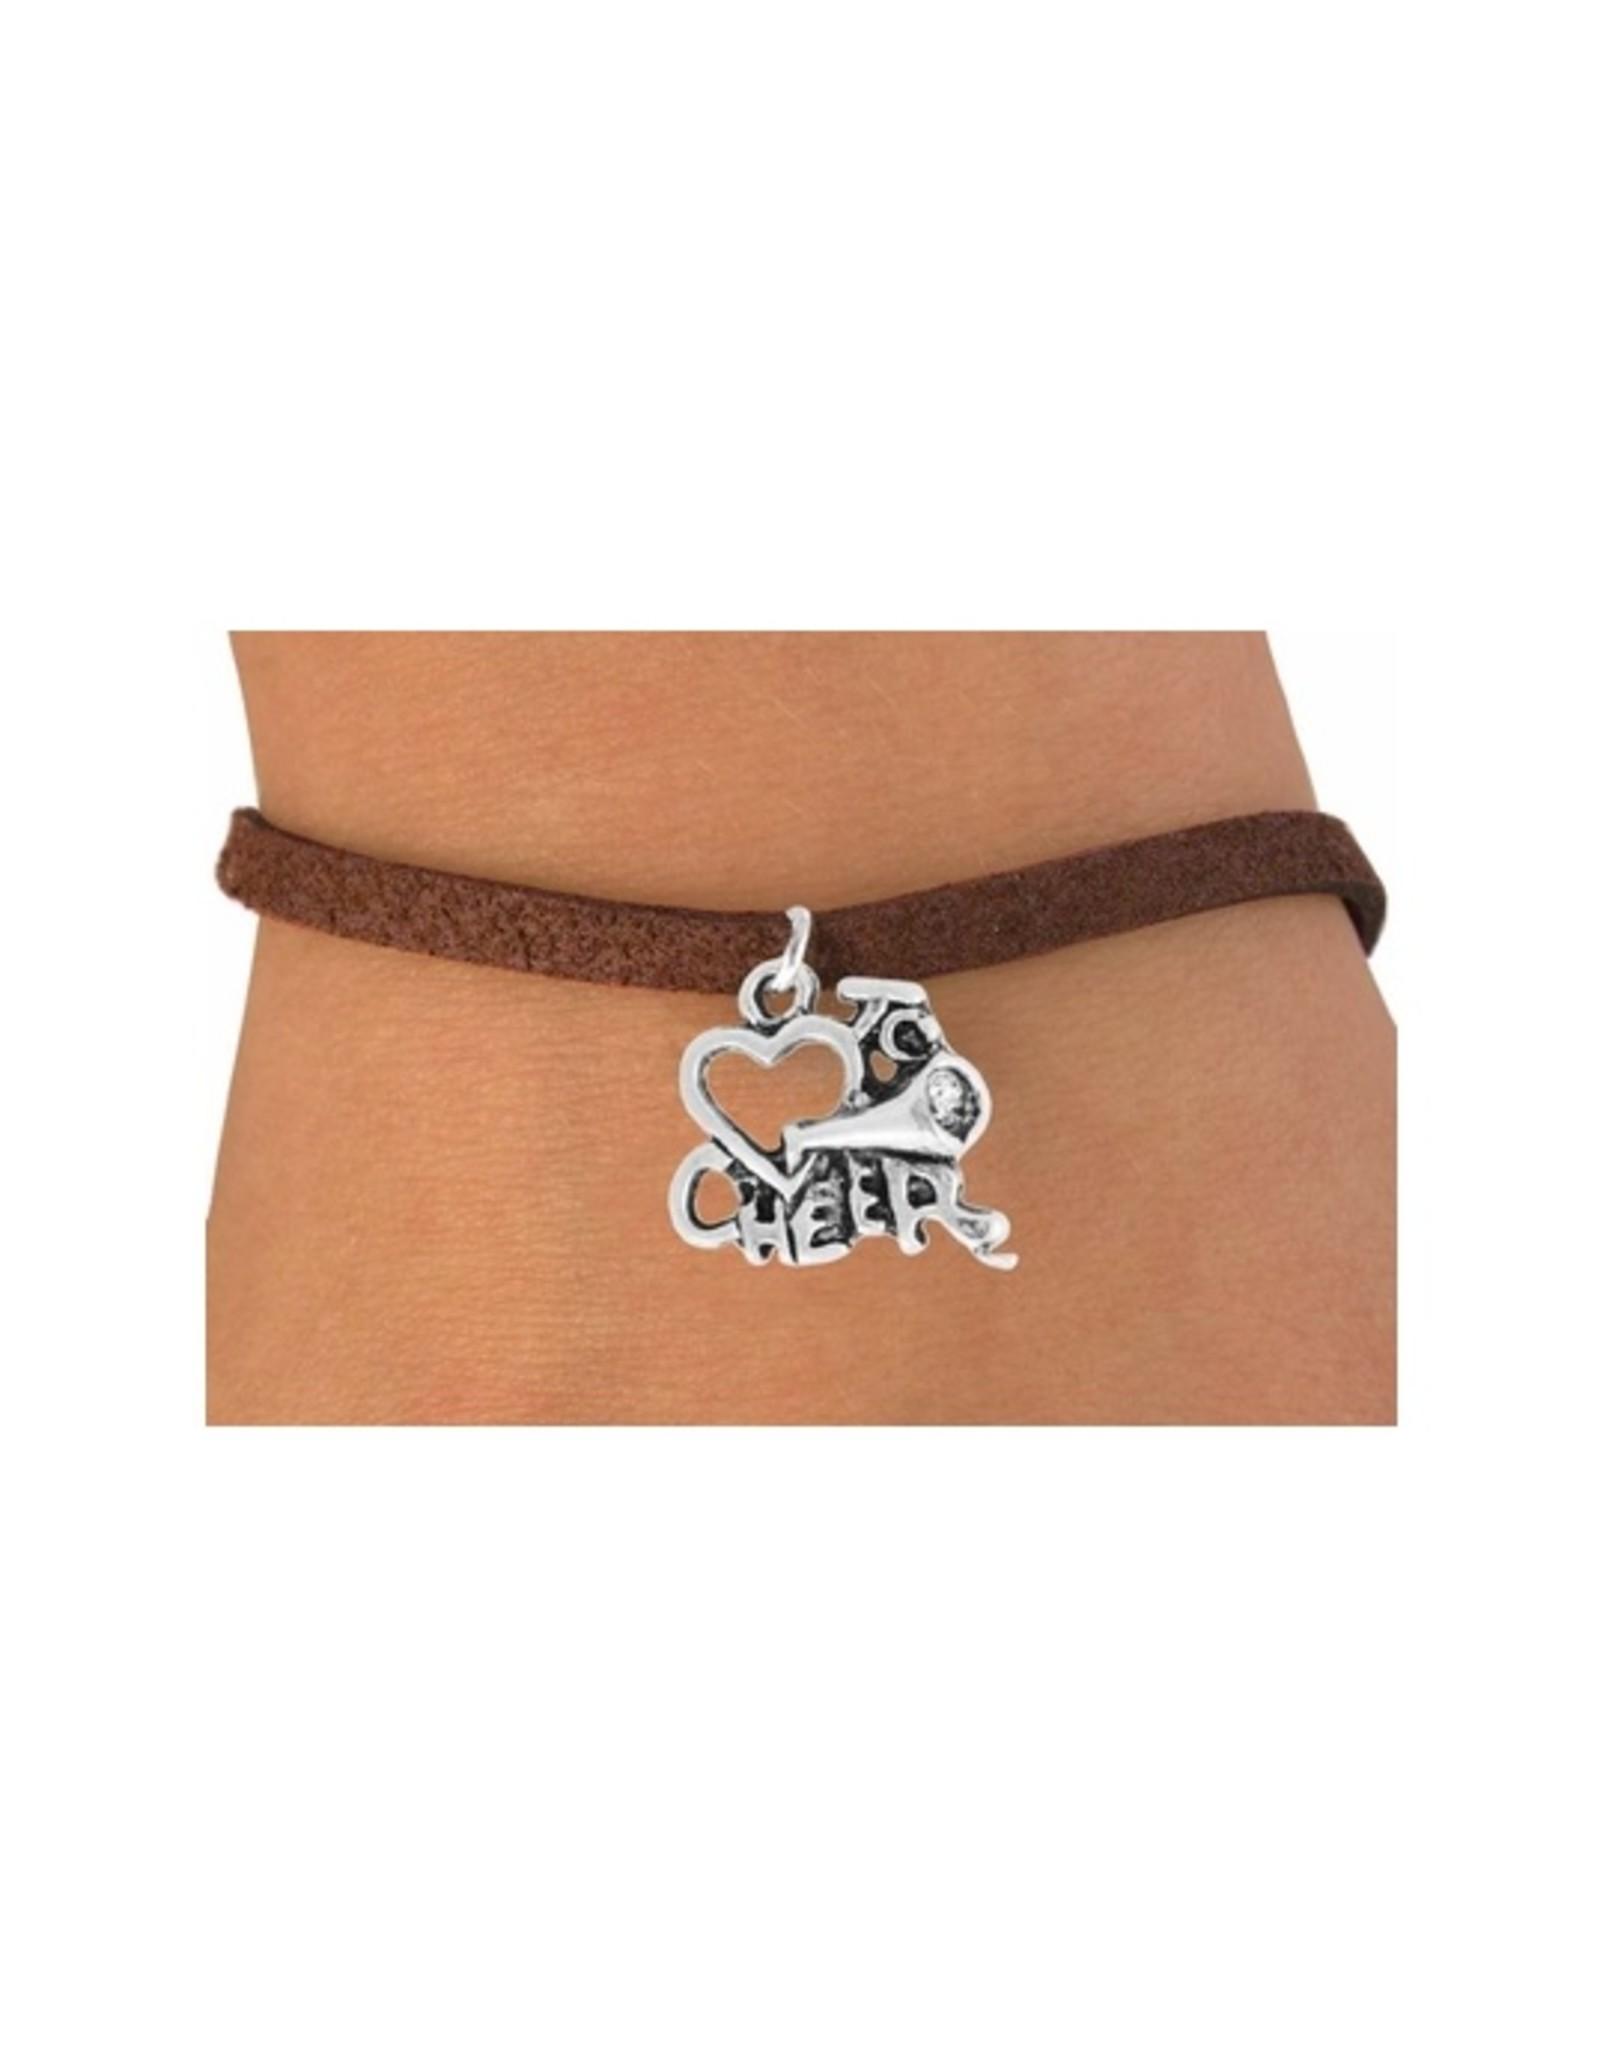 Love to Cheer Bracelet